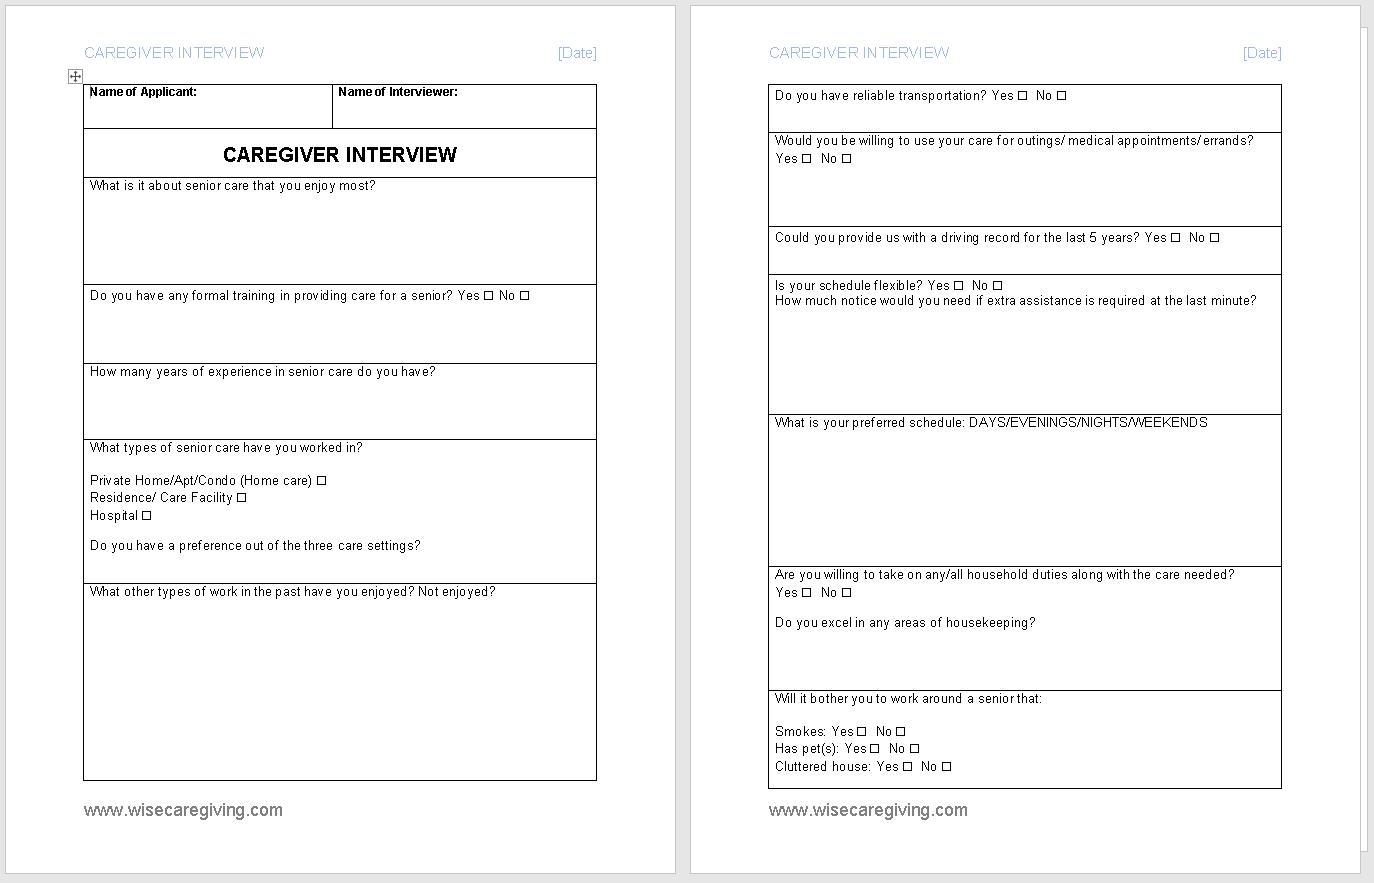 Caregiver Interview Questionnaire-Wise Caregiving.docx - Word